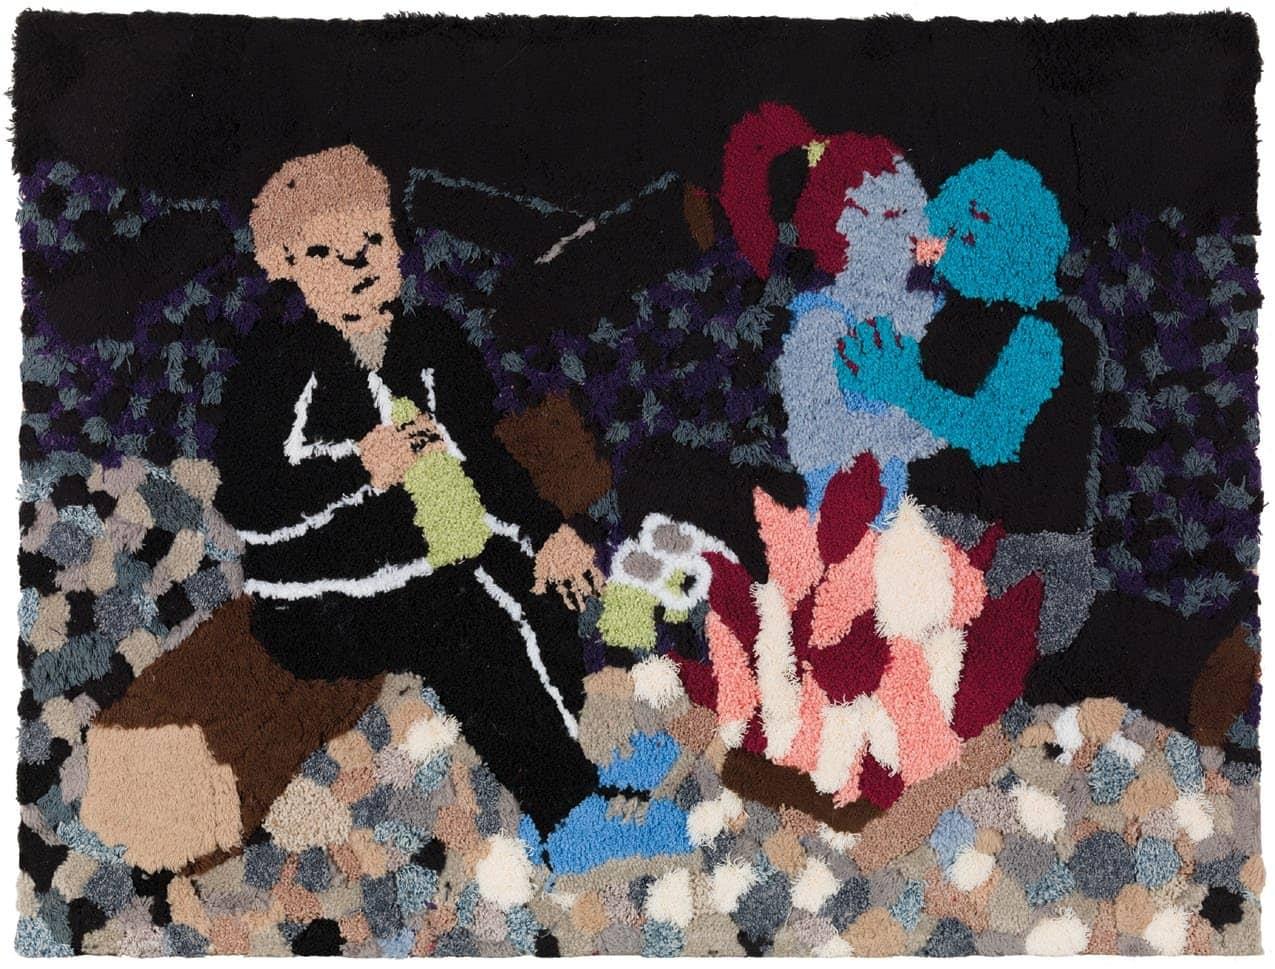 Jessica Campbell's Carpet And Comics At Chicago MCA